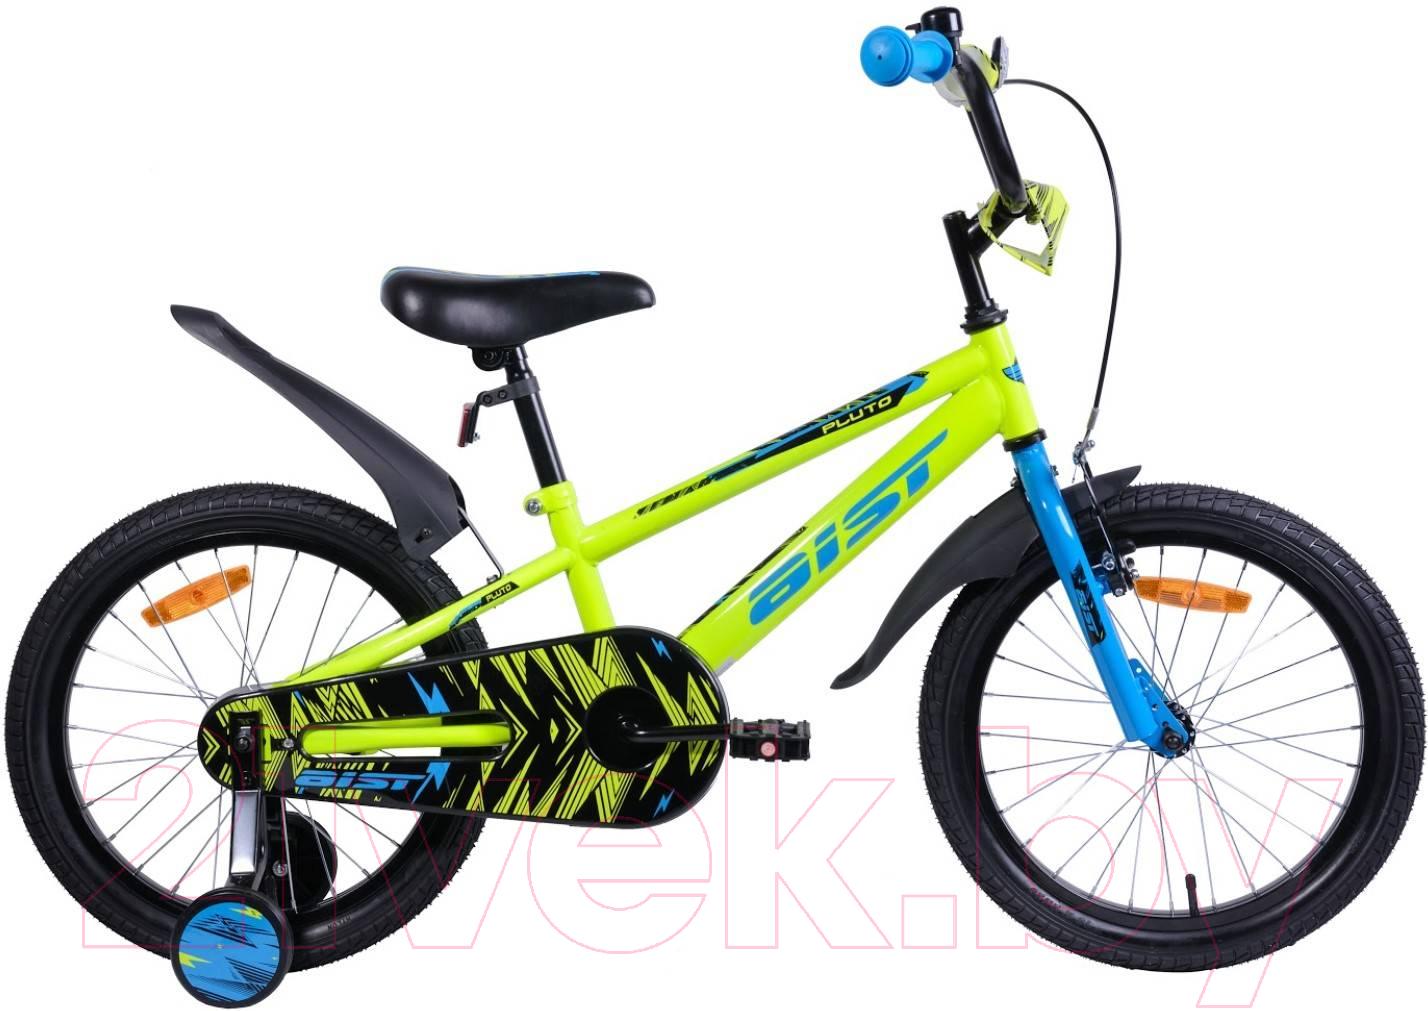 Купить Детский велосипед AIST, Pluto 2019 (18, желтый), Беларусь